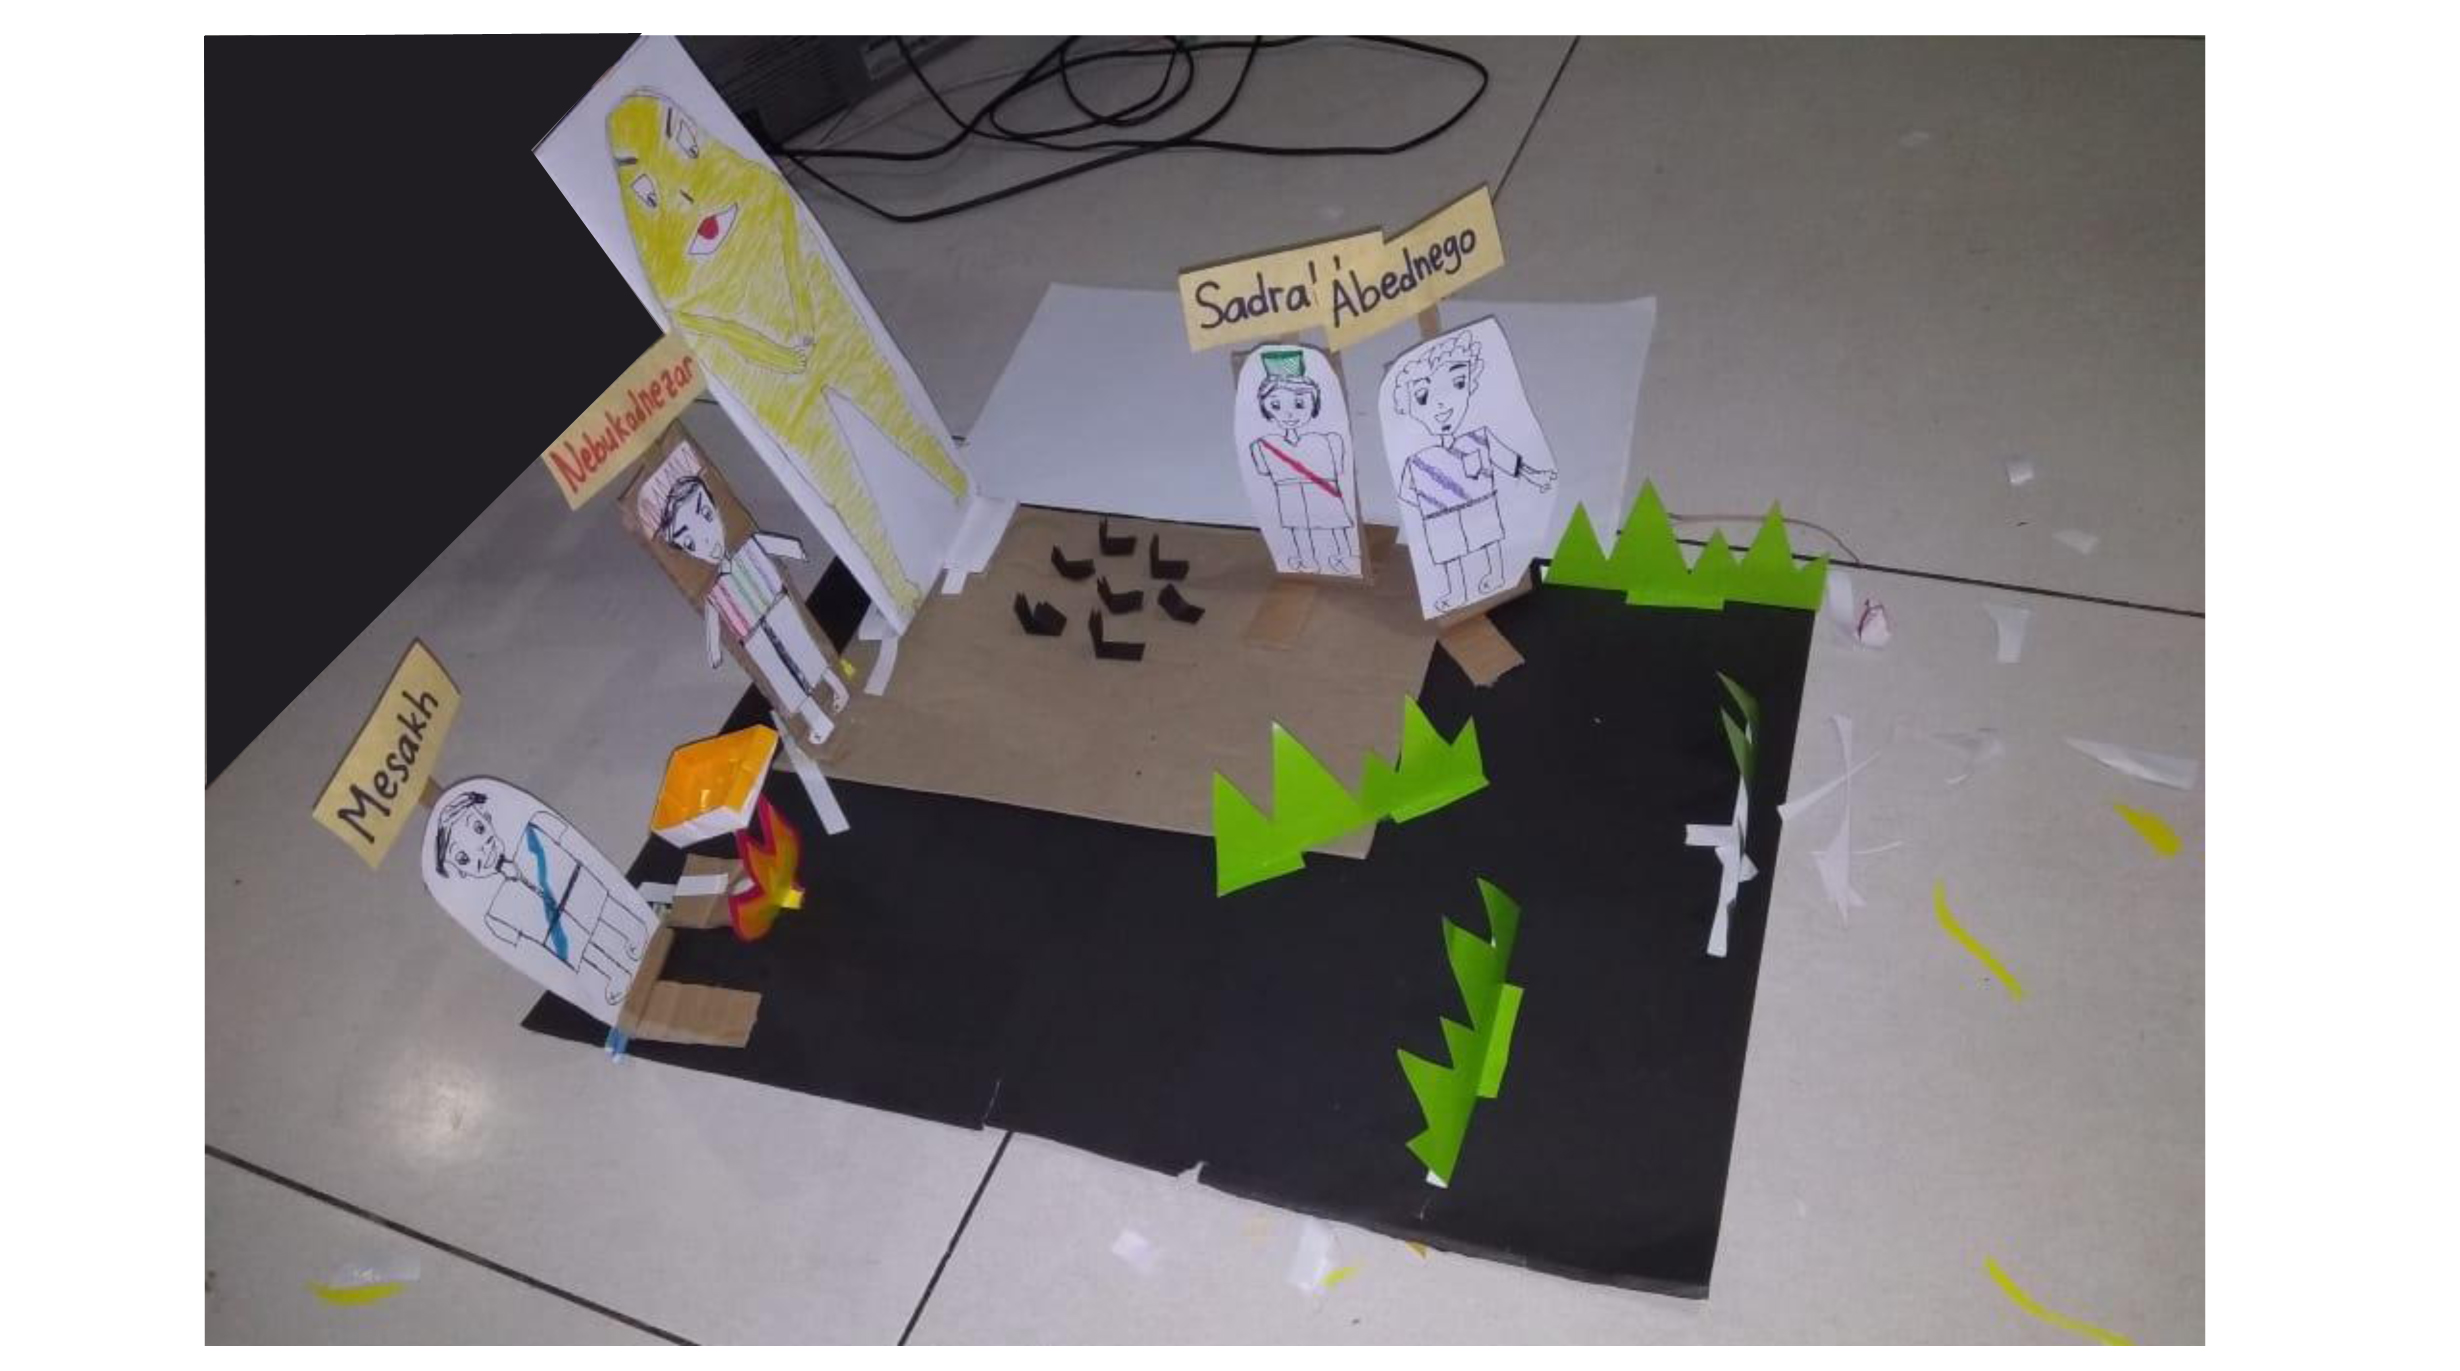 Pembinaan GSM: Bercerita dengan Kreatif dan Ceria, HKBP Pasar Rebo